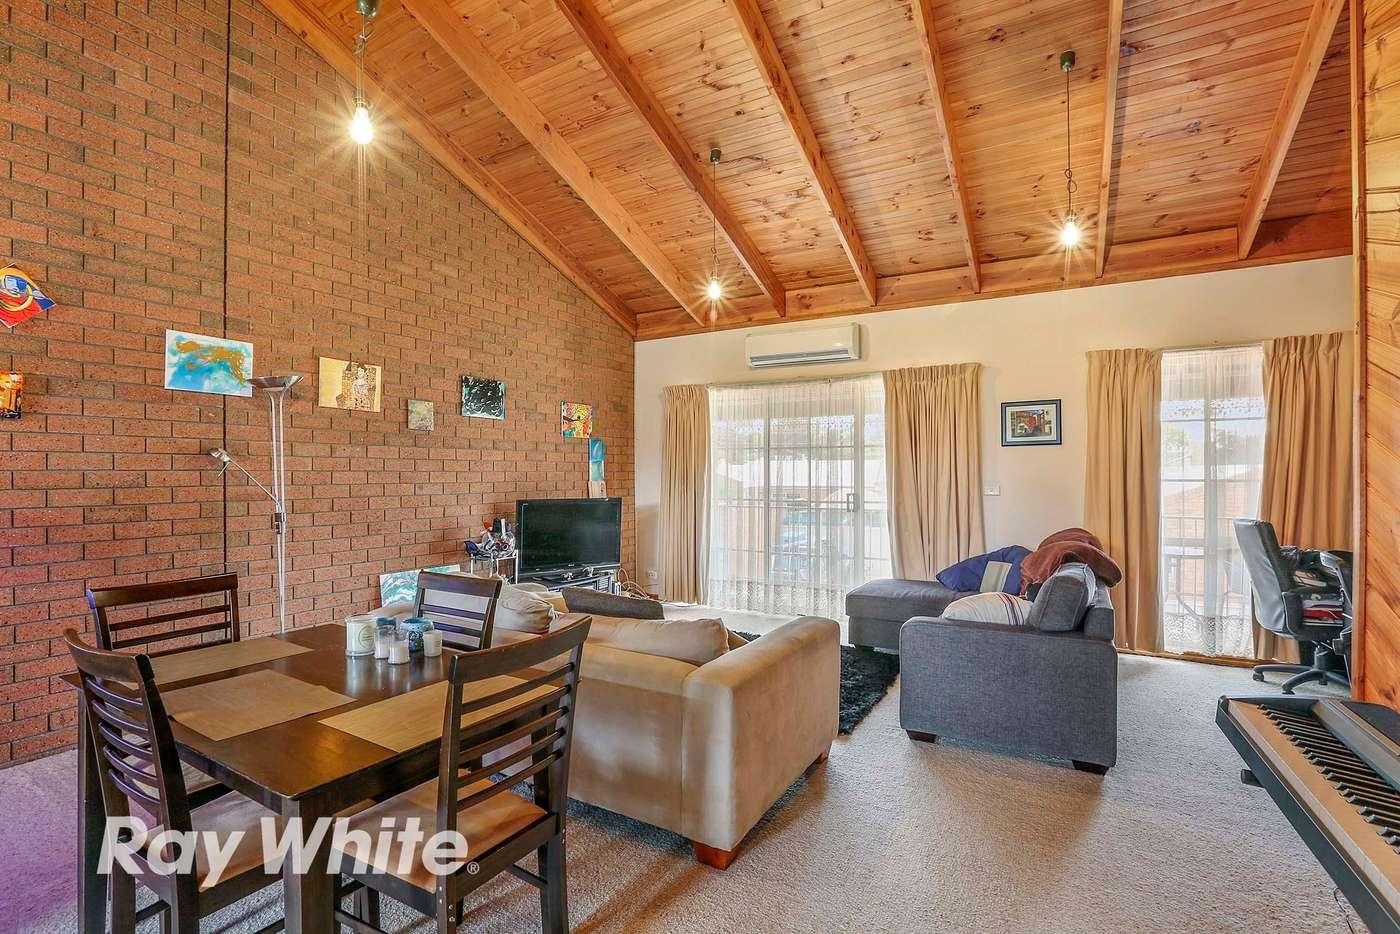 Main view of Homely unit listing, 4/2 Selwyn Street, Lara VIC 3212